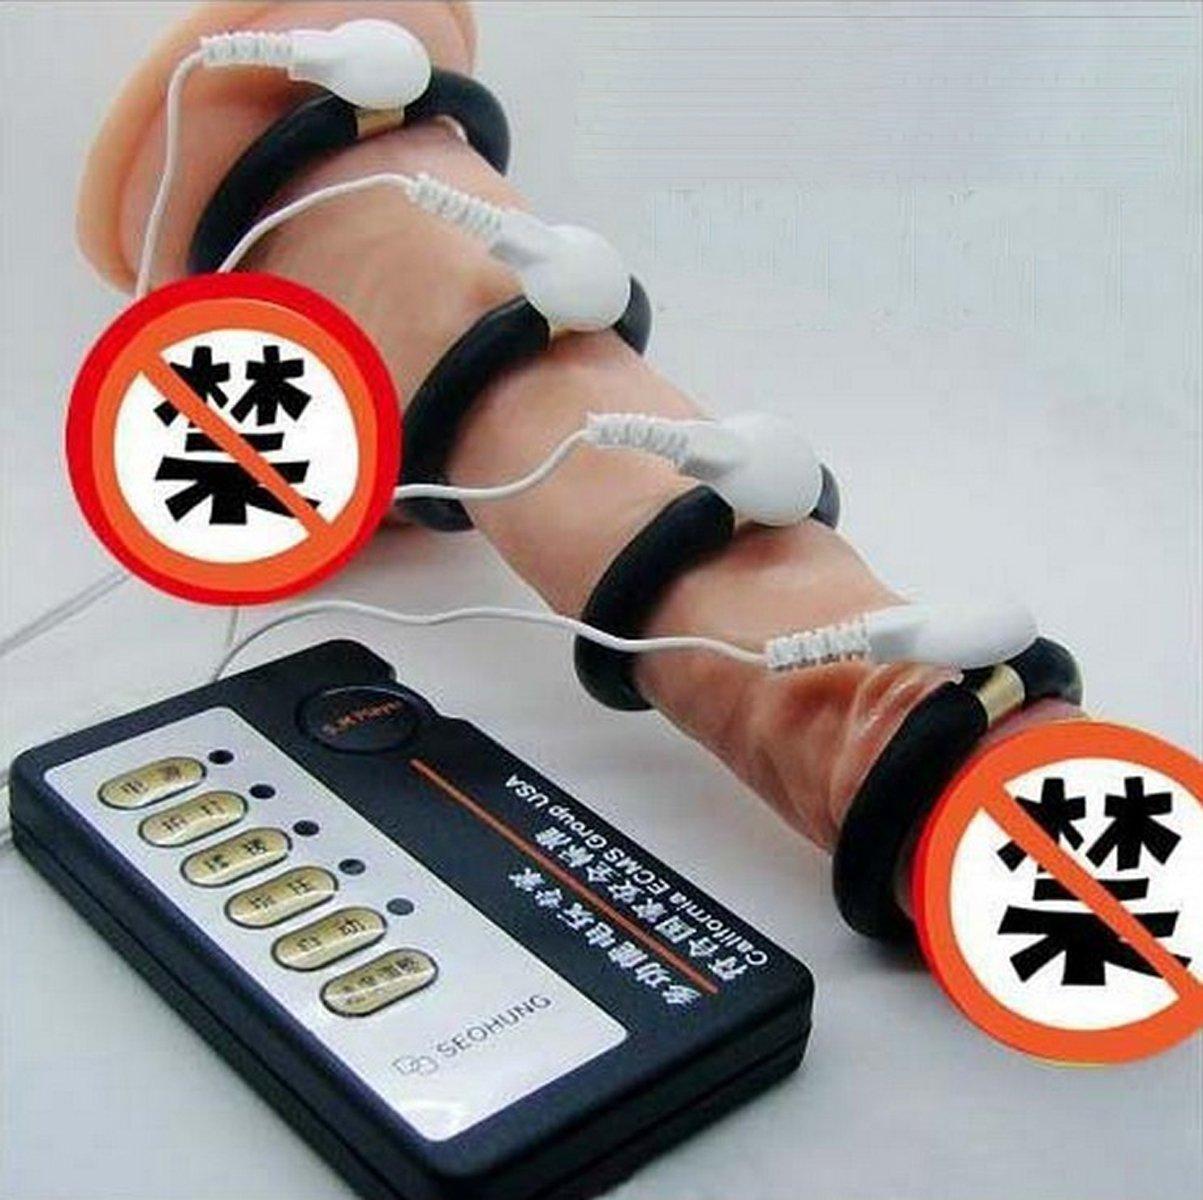 Male Electro Toleto Penis Enlarger Stimulator Gay Expander Stretcher Rings Enhancement Erection Aid